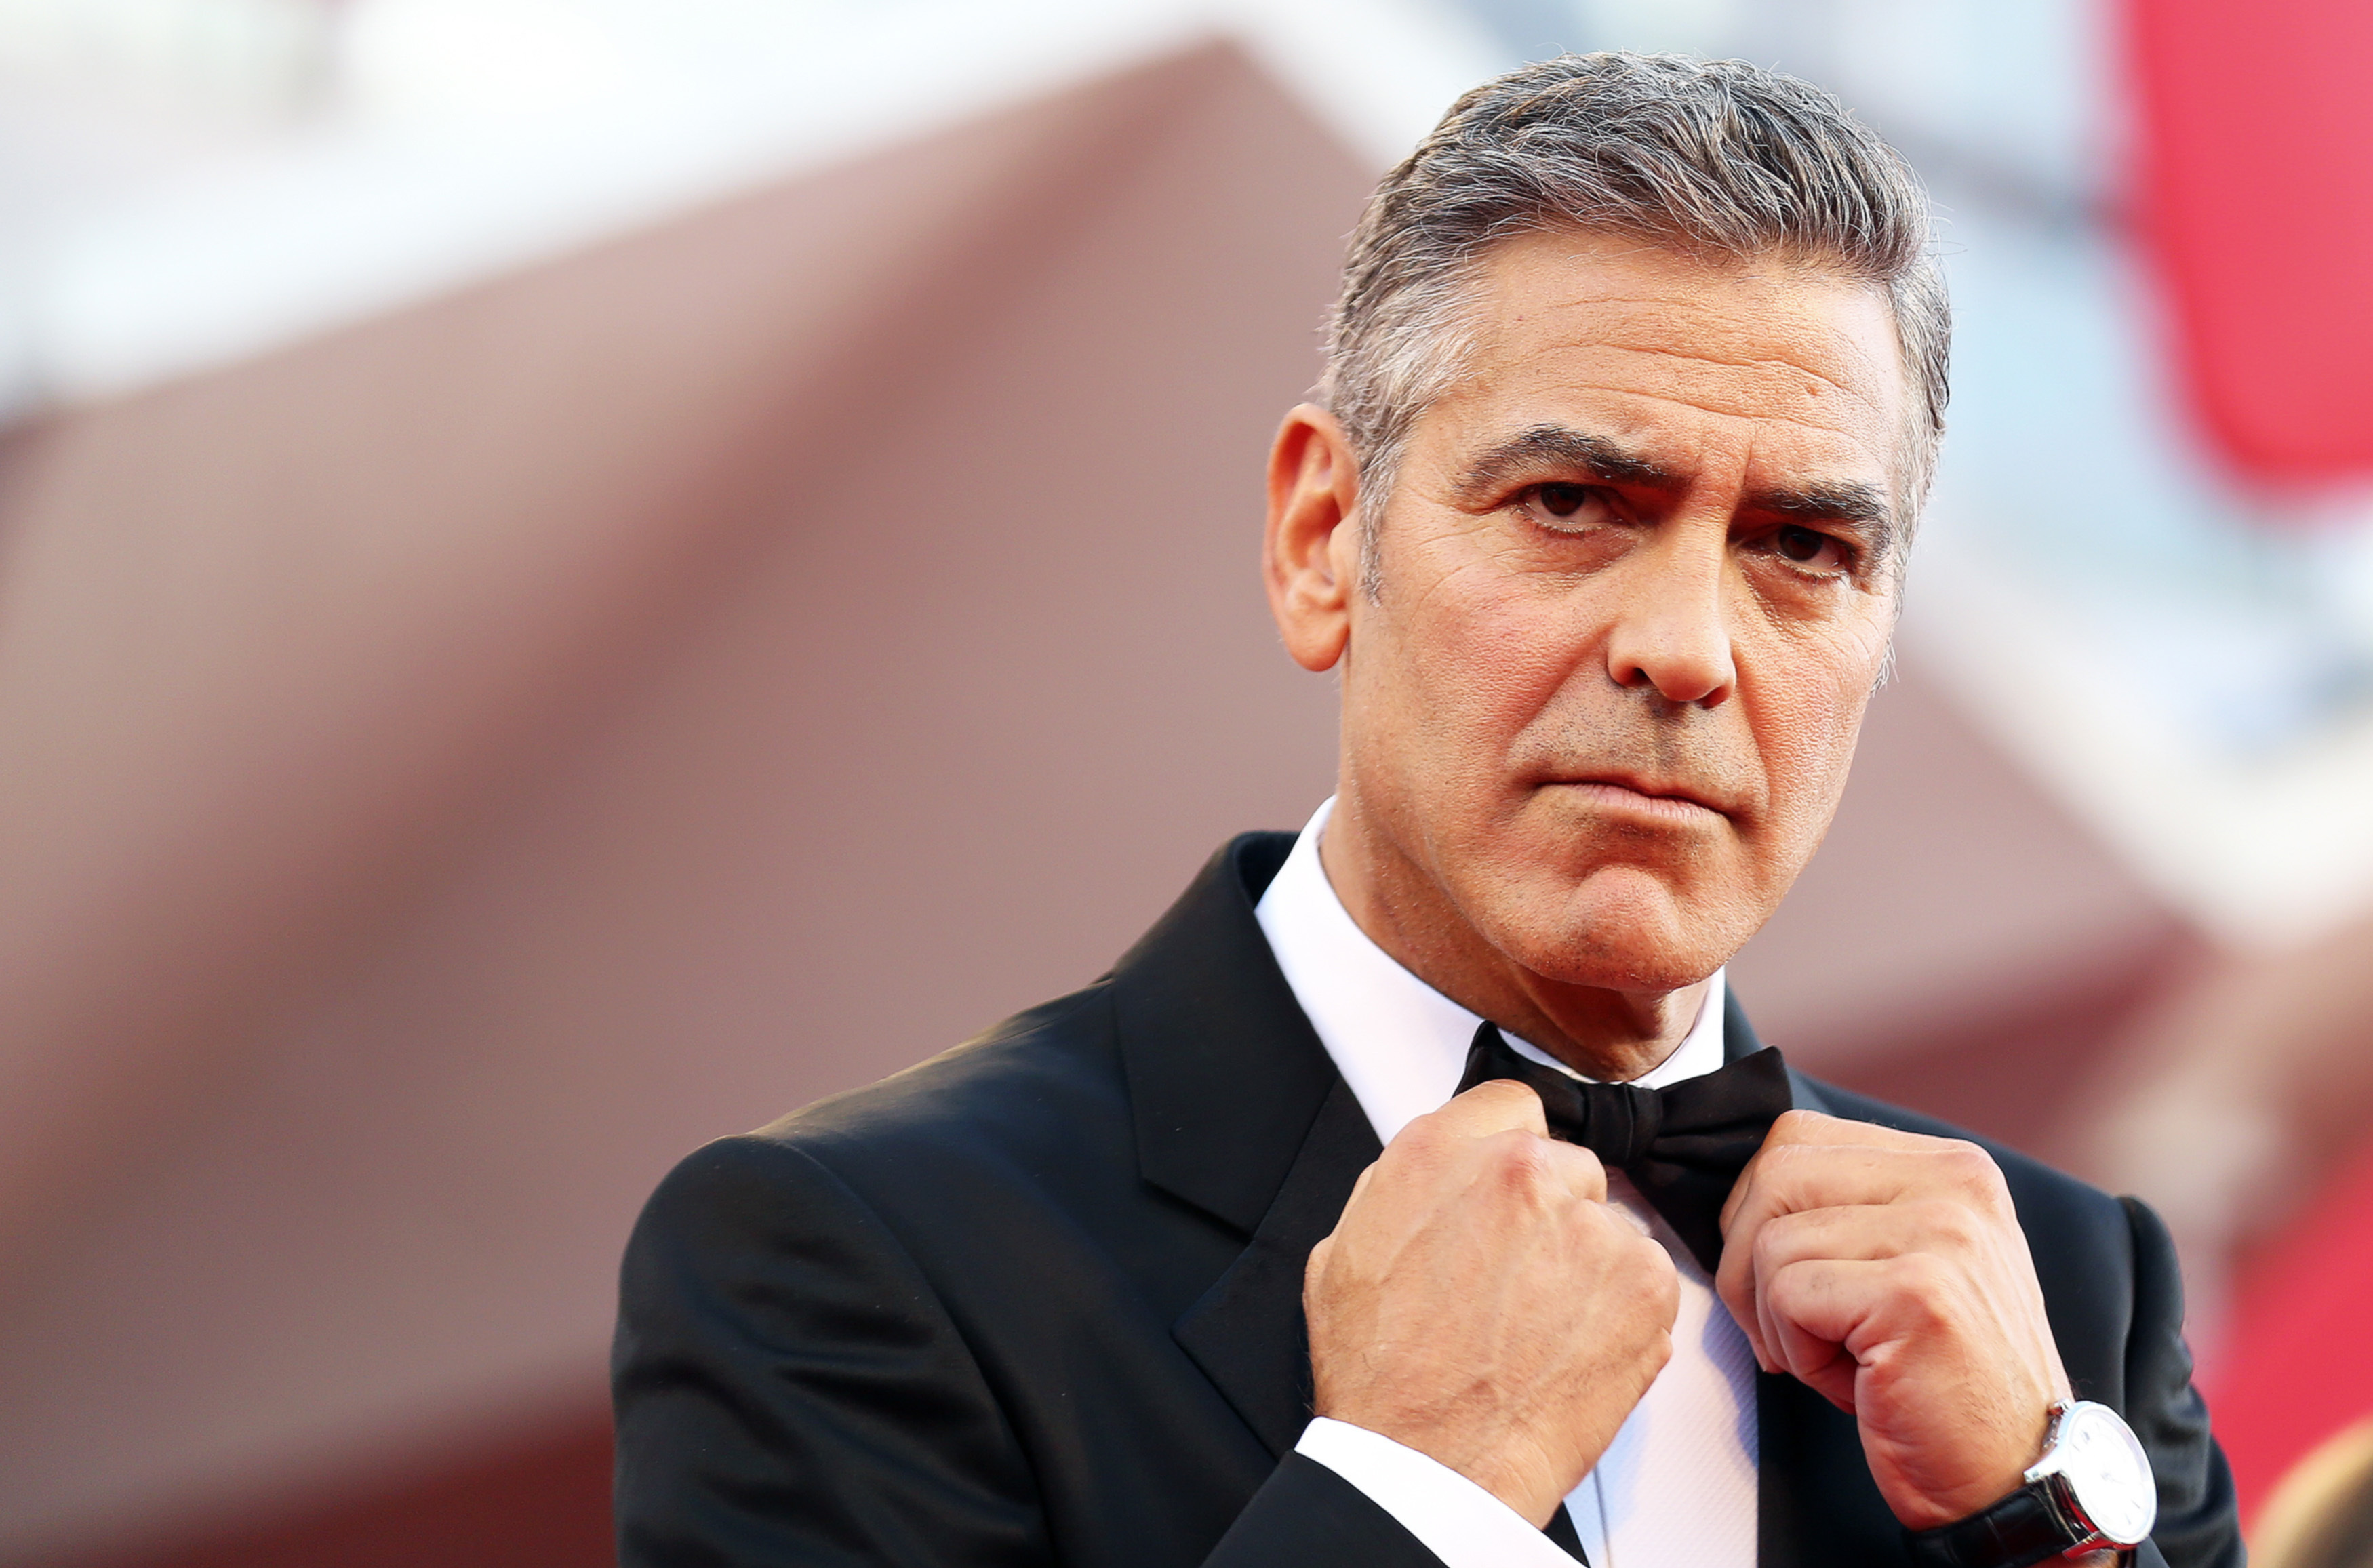 George Clooney Full Hd